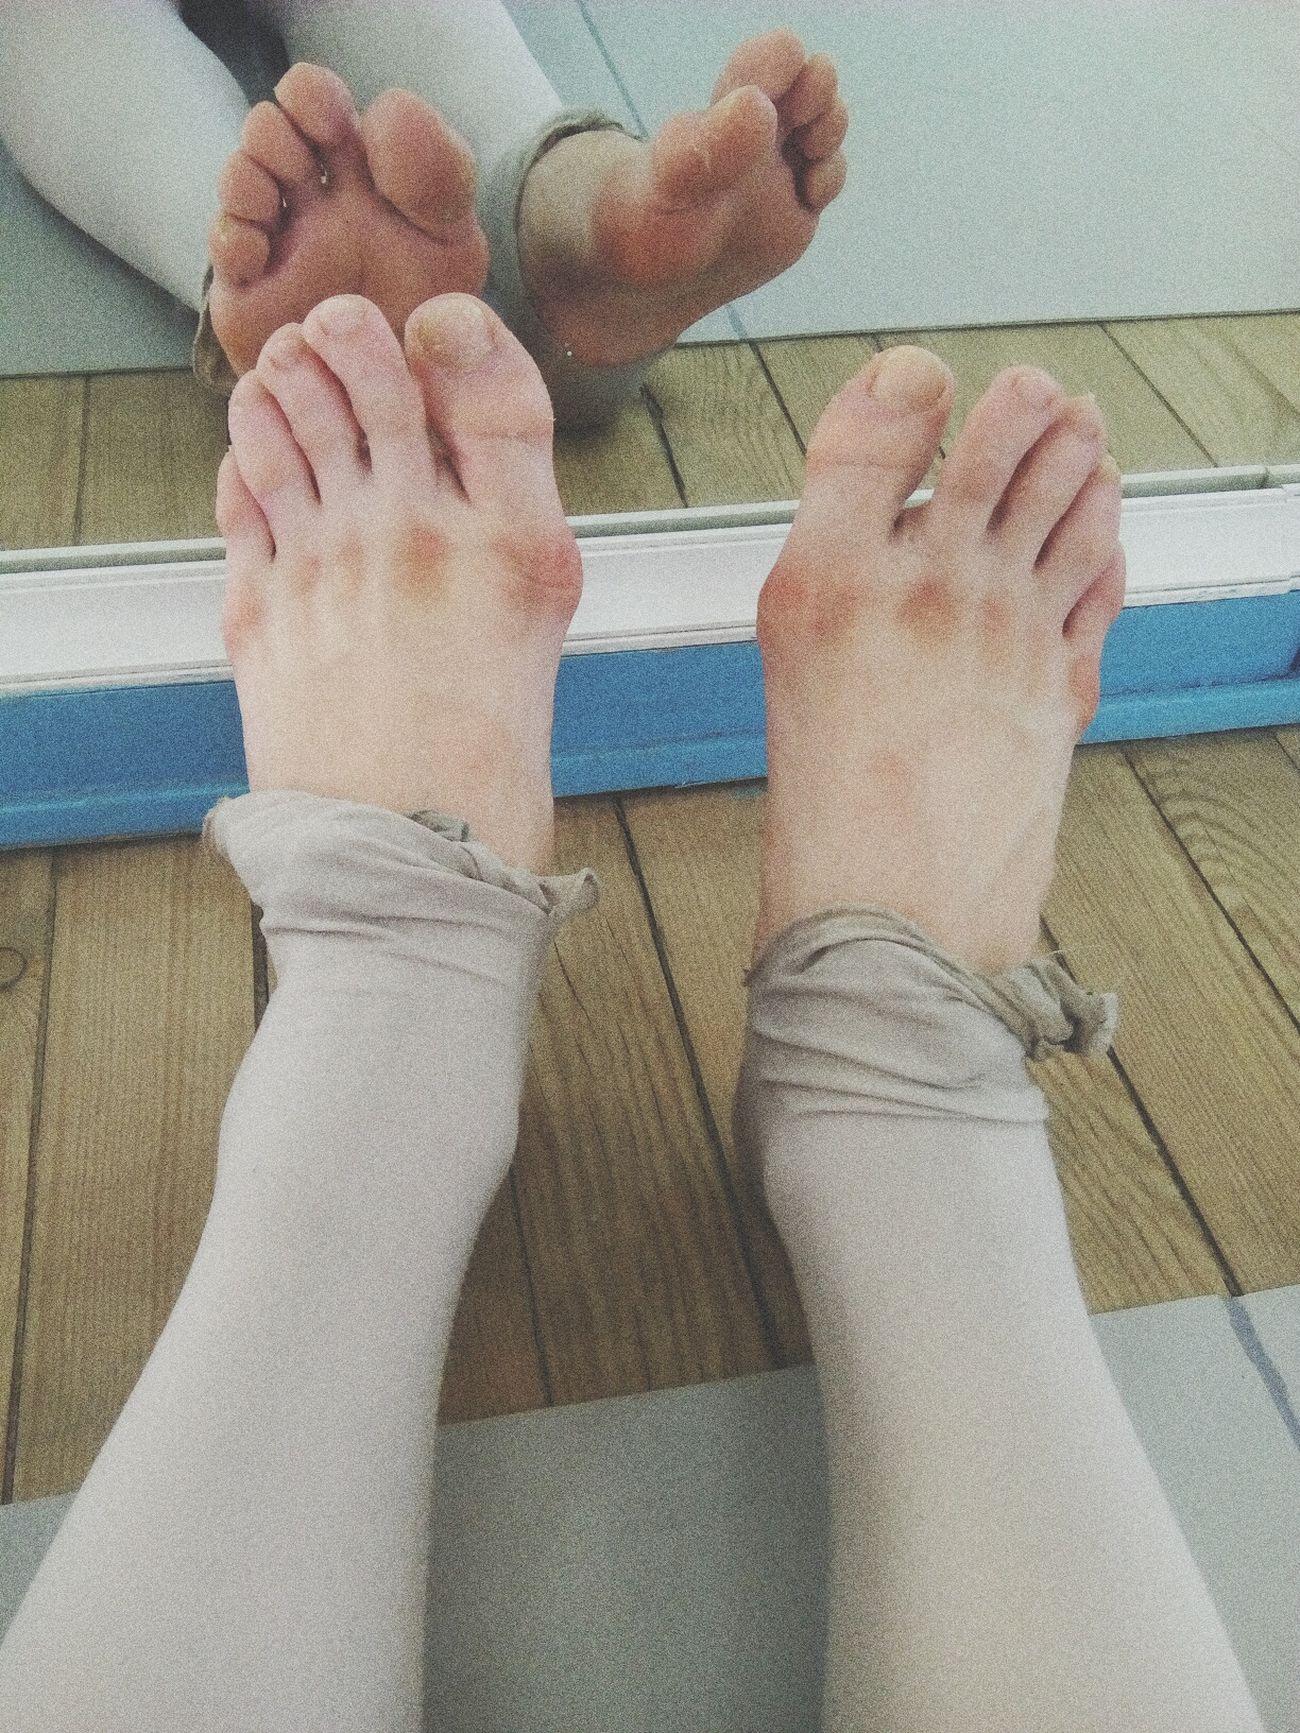 Legs Day Work Hard Work Tired Life Love Ballet Shoes Ballet ❤ Ballerina Theater Dream Lifestyles